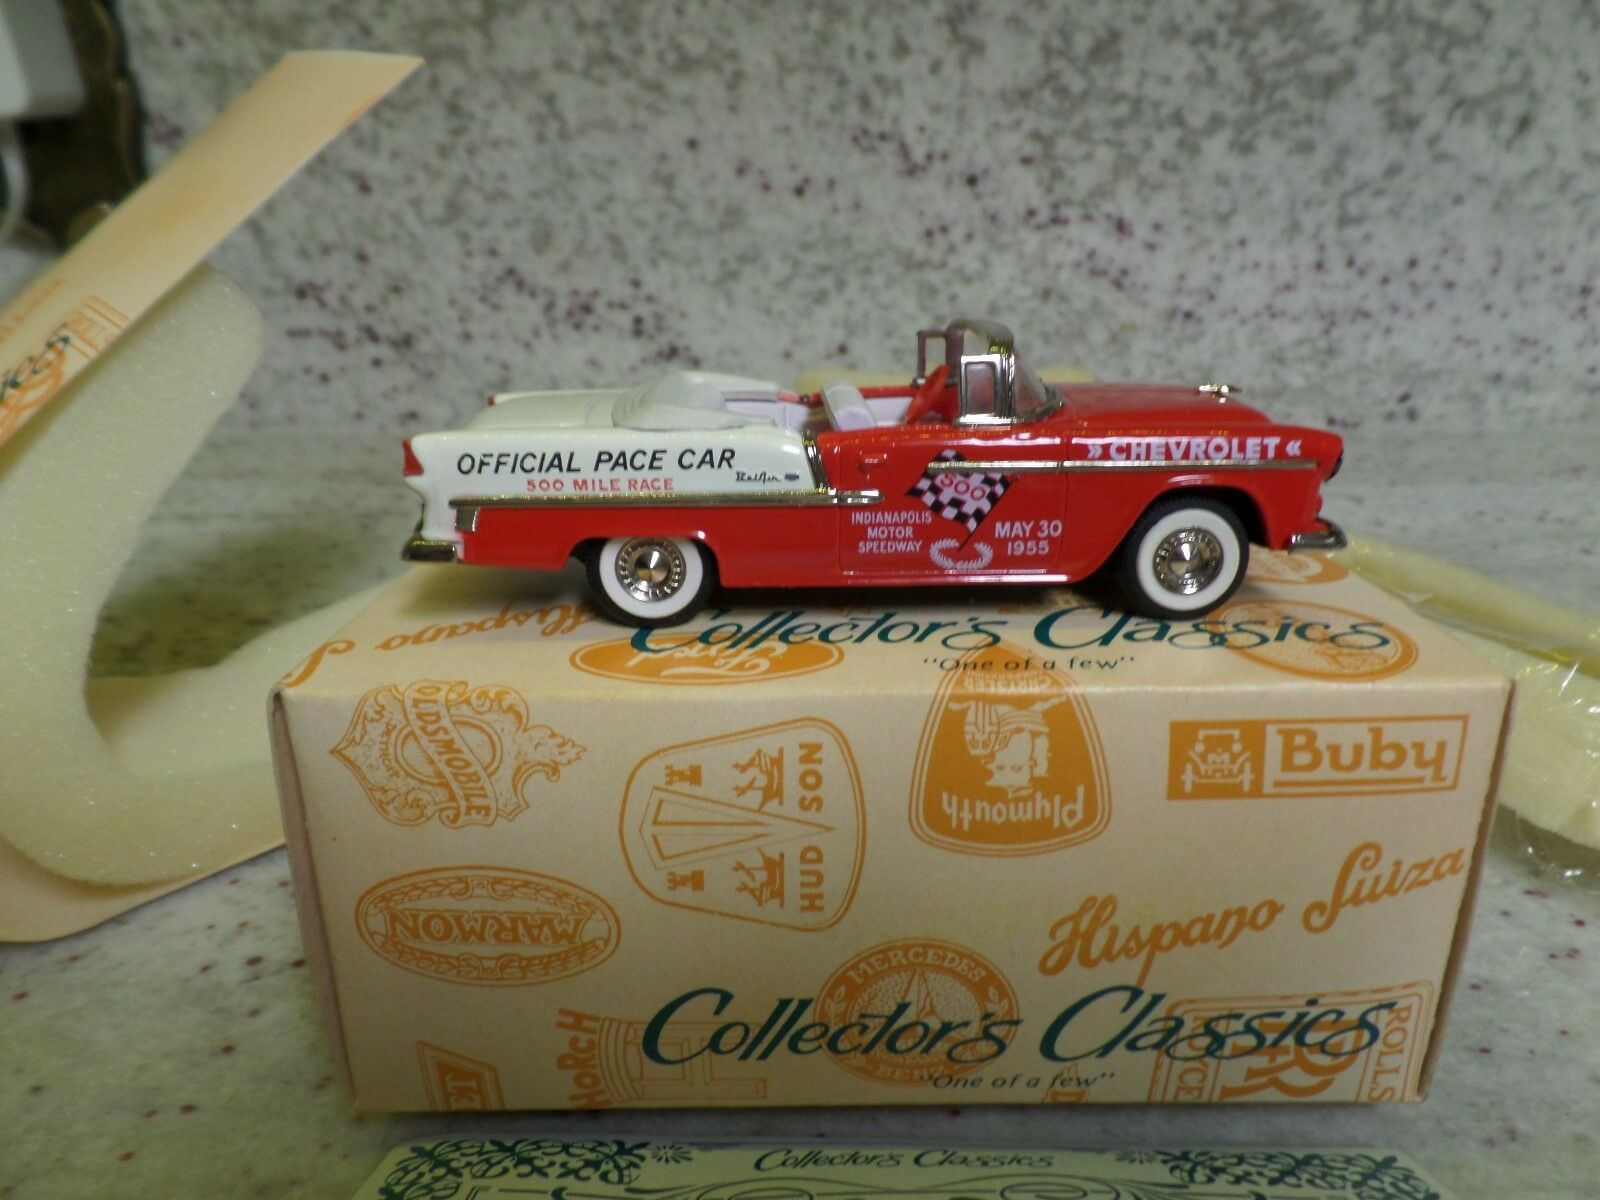 1955 Chevrolet Pace, coleccionista clásico